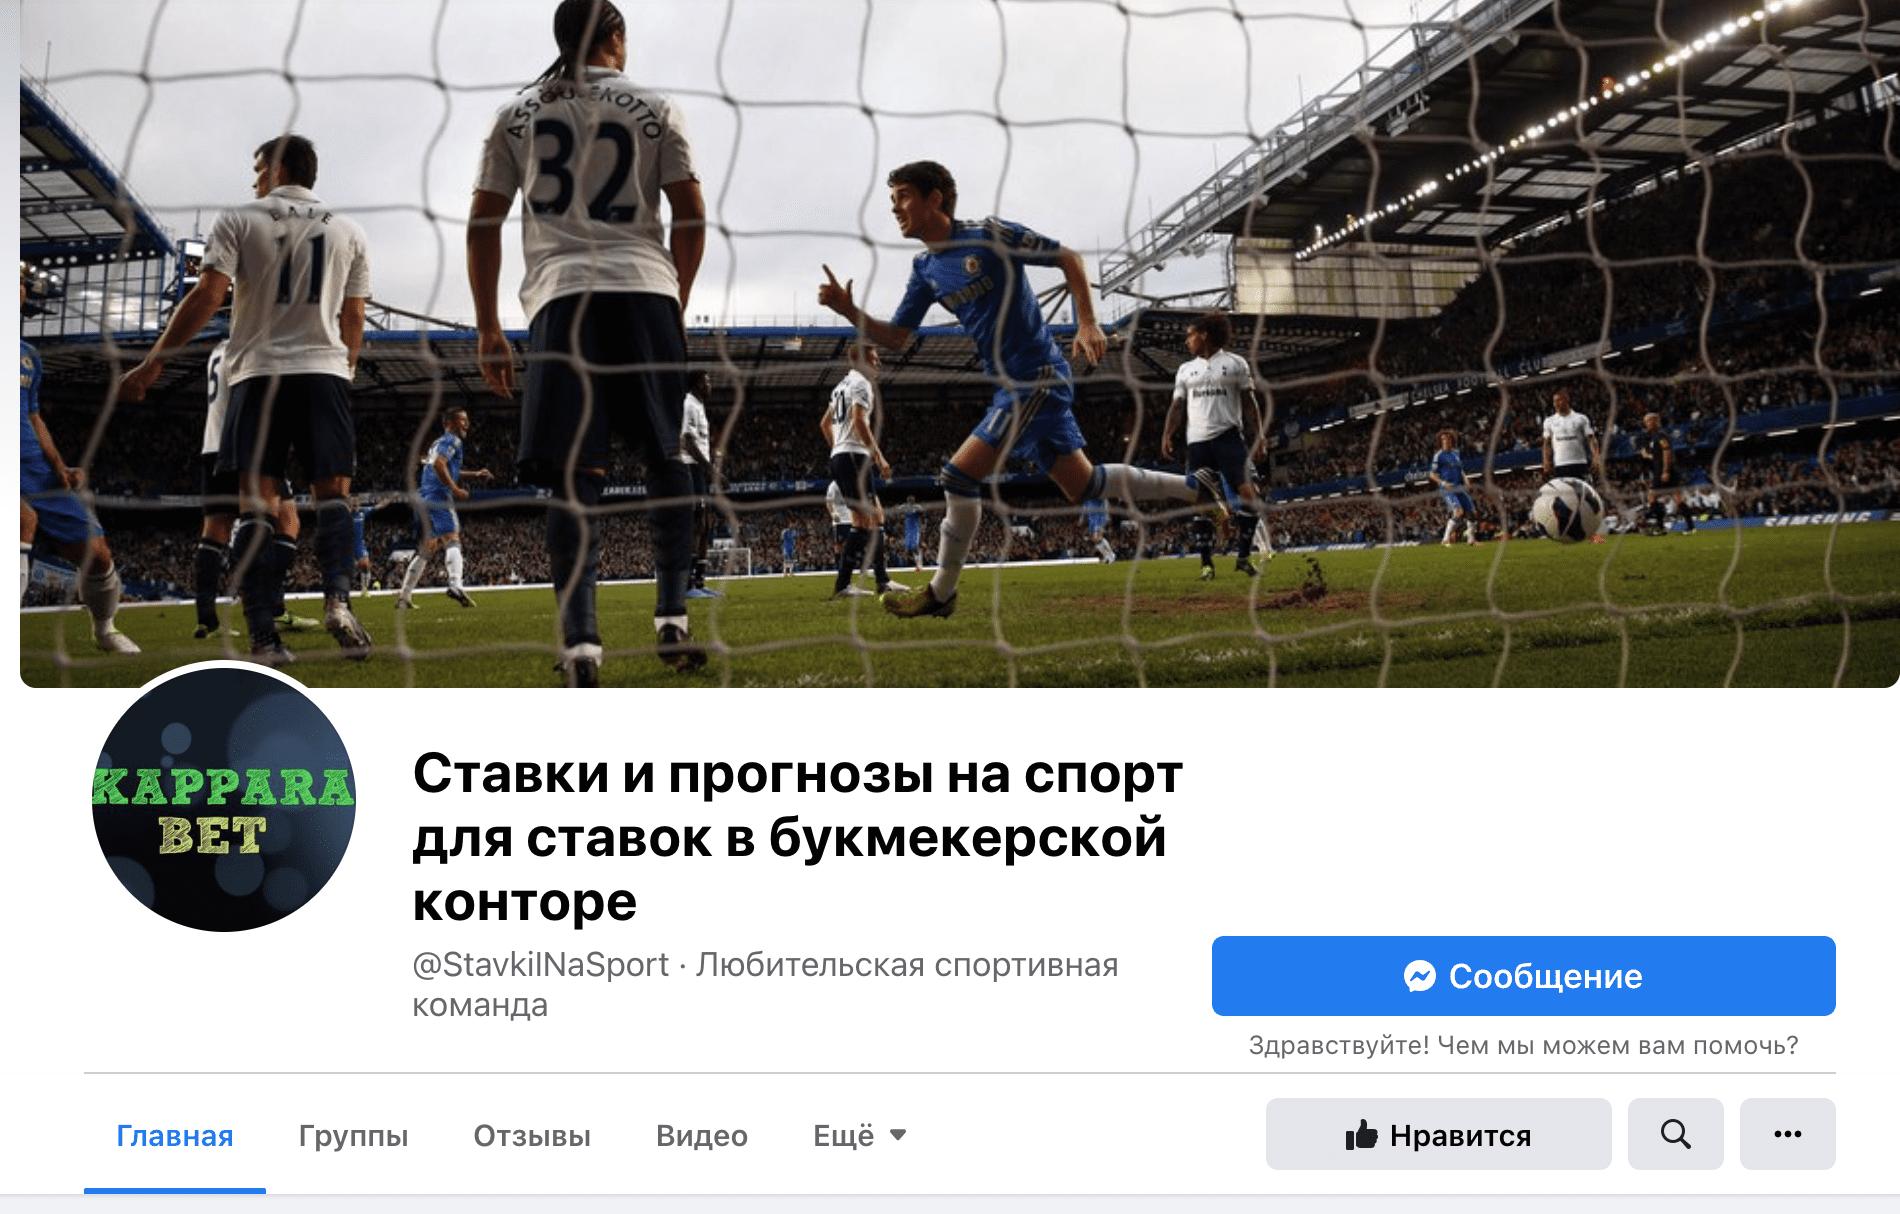 Фейсбук страница Kappara ru(Каппара.ру)